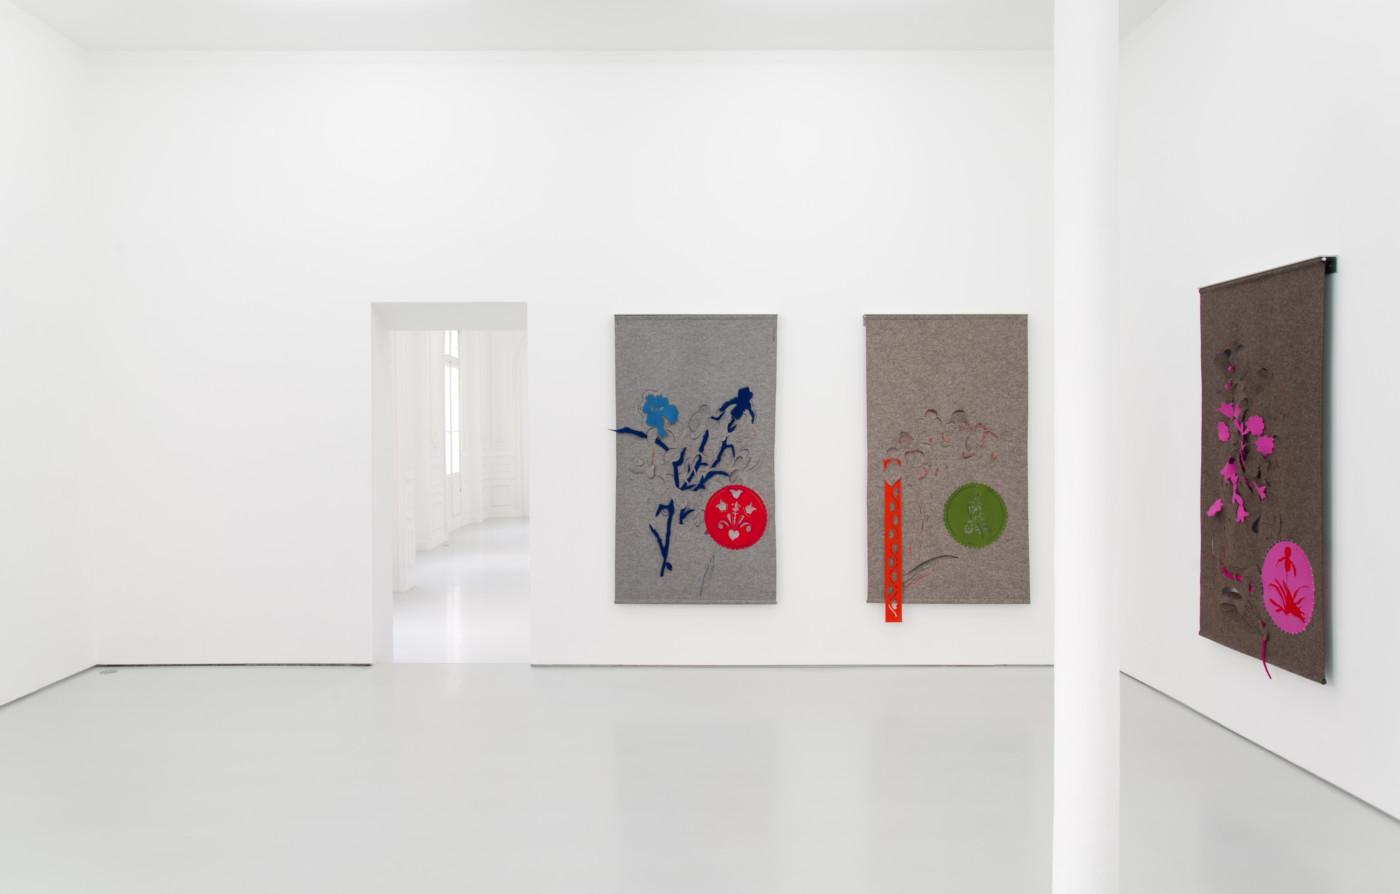 DENA YAGO  Force Majeure , 2019, High Art, Paris, installation view - High Art Gallery Paris